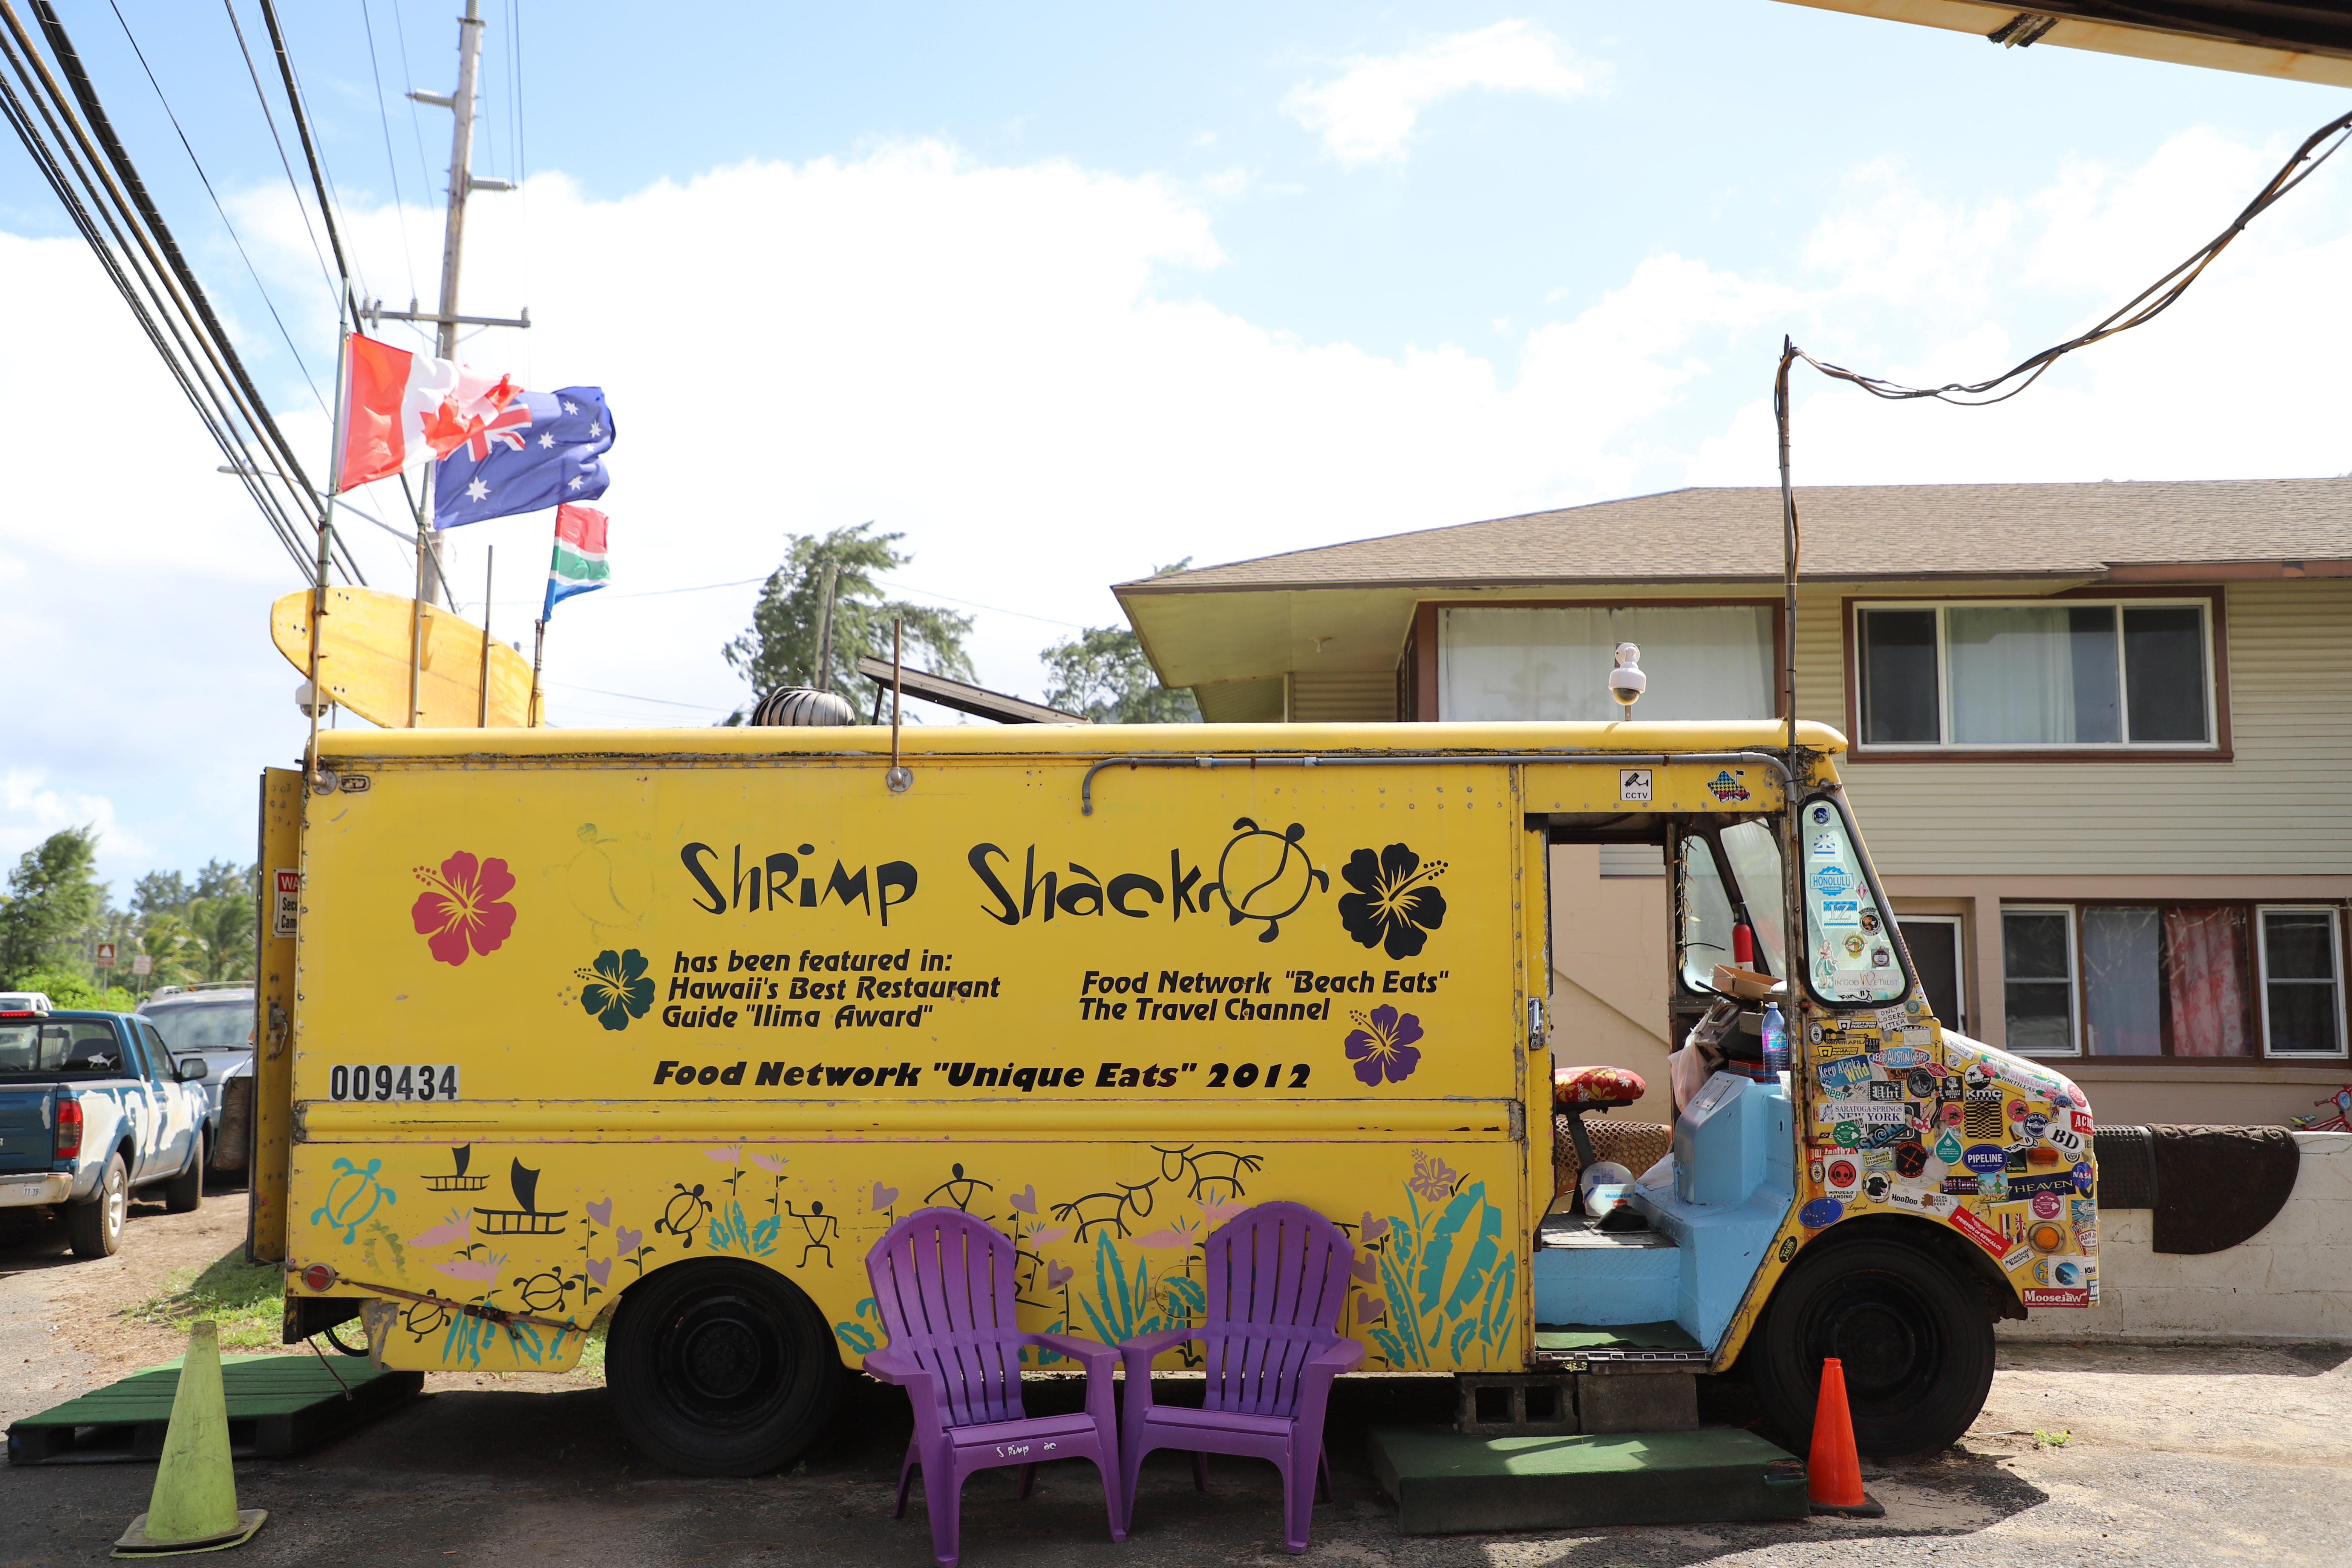 2018 11 11 147 Oahu HI North Shore.JPG